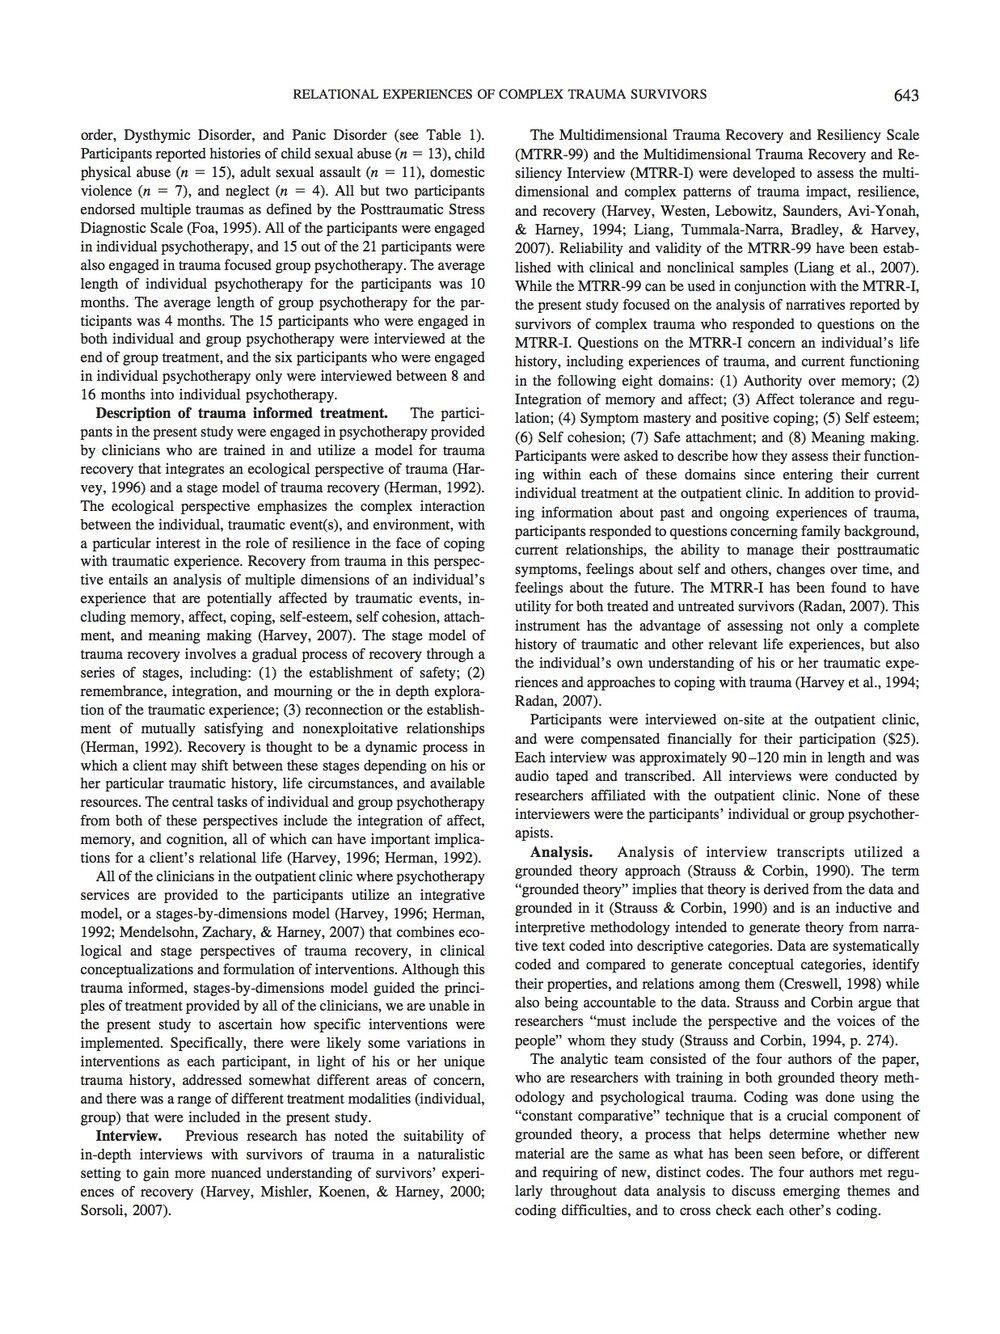 paper p4.jpg